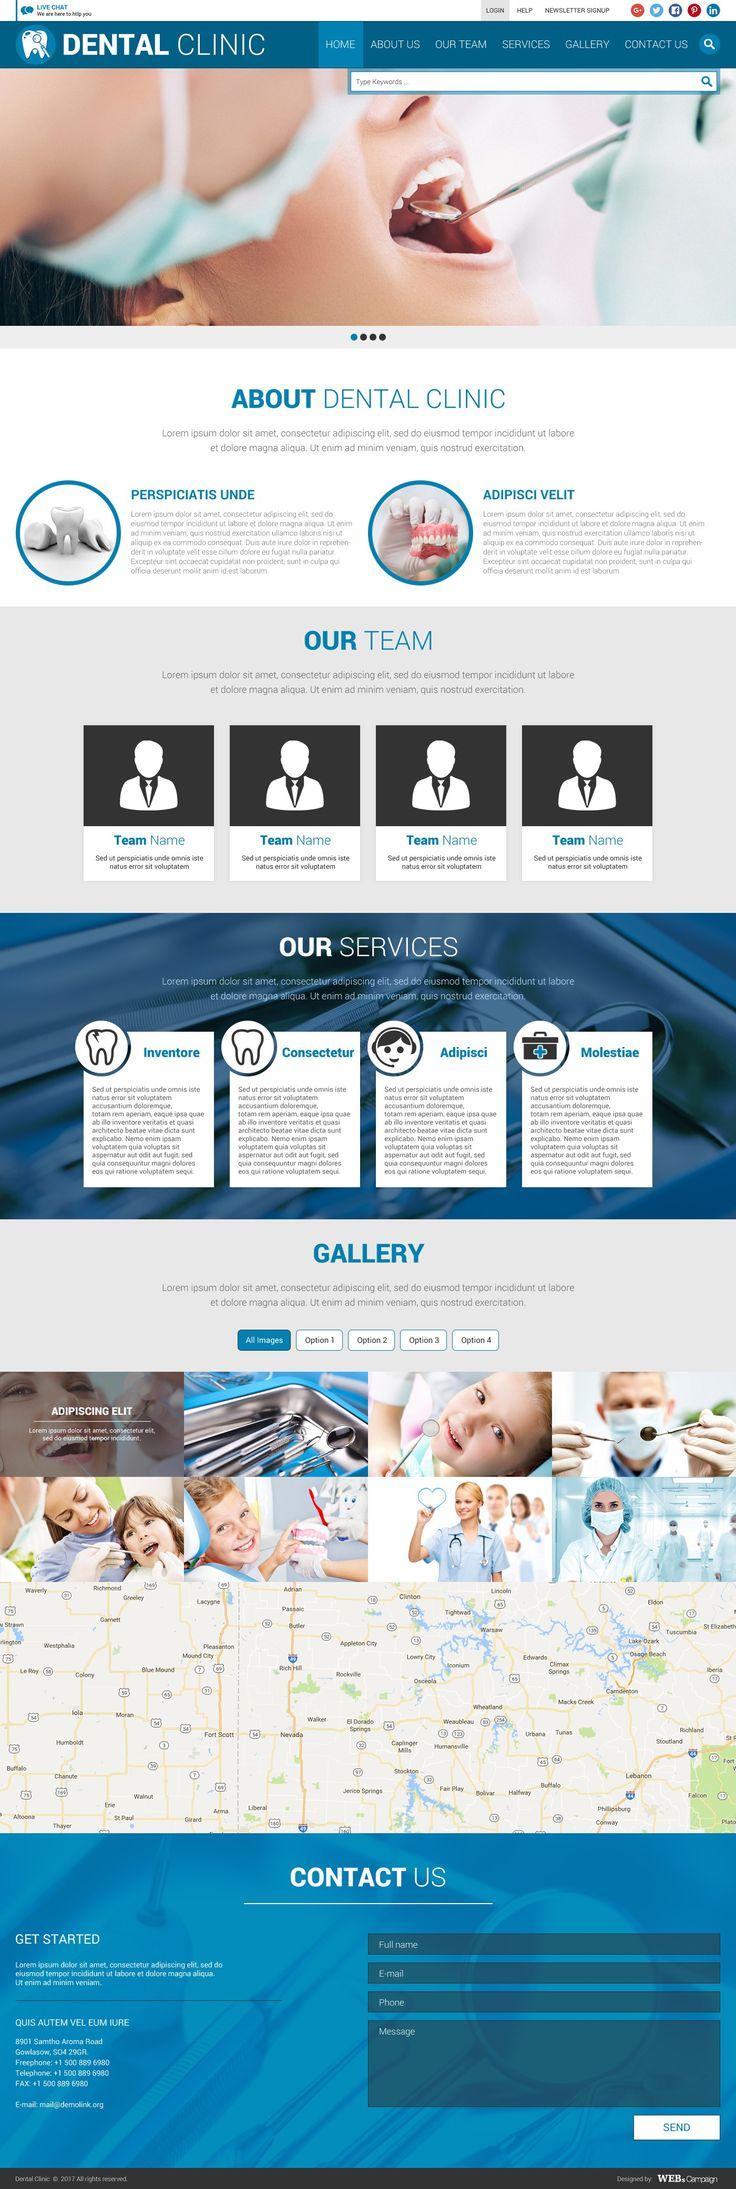 PSD Free Dental Clinic Web Template